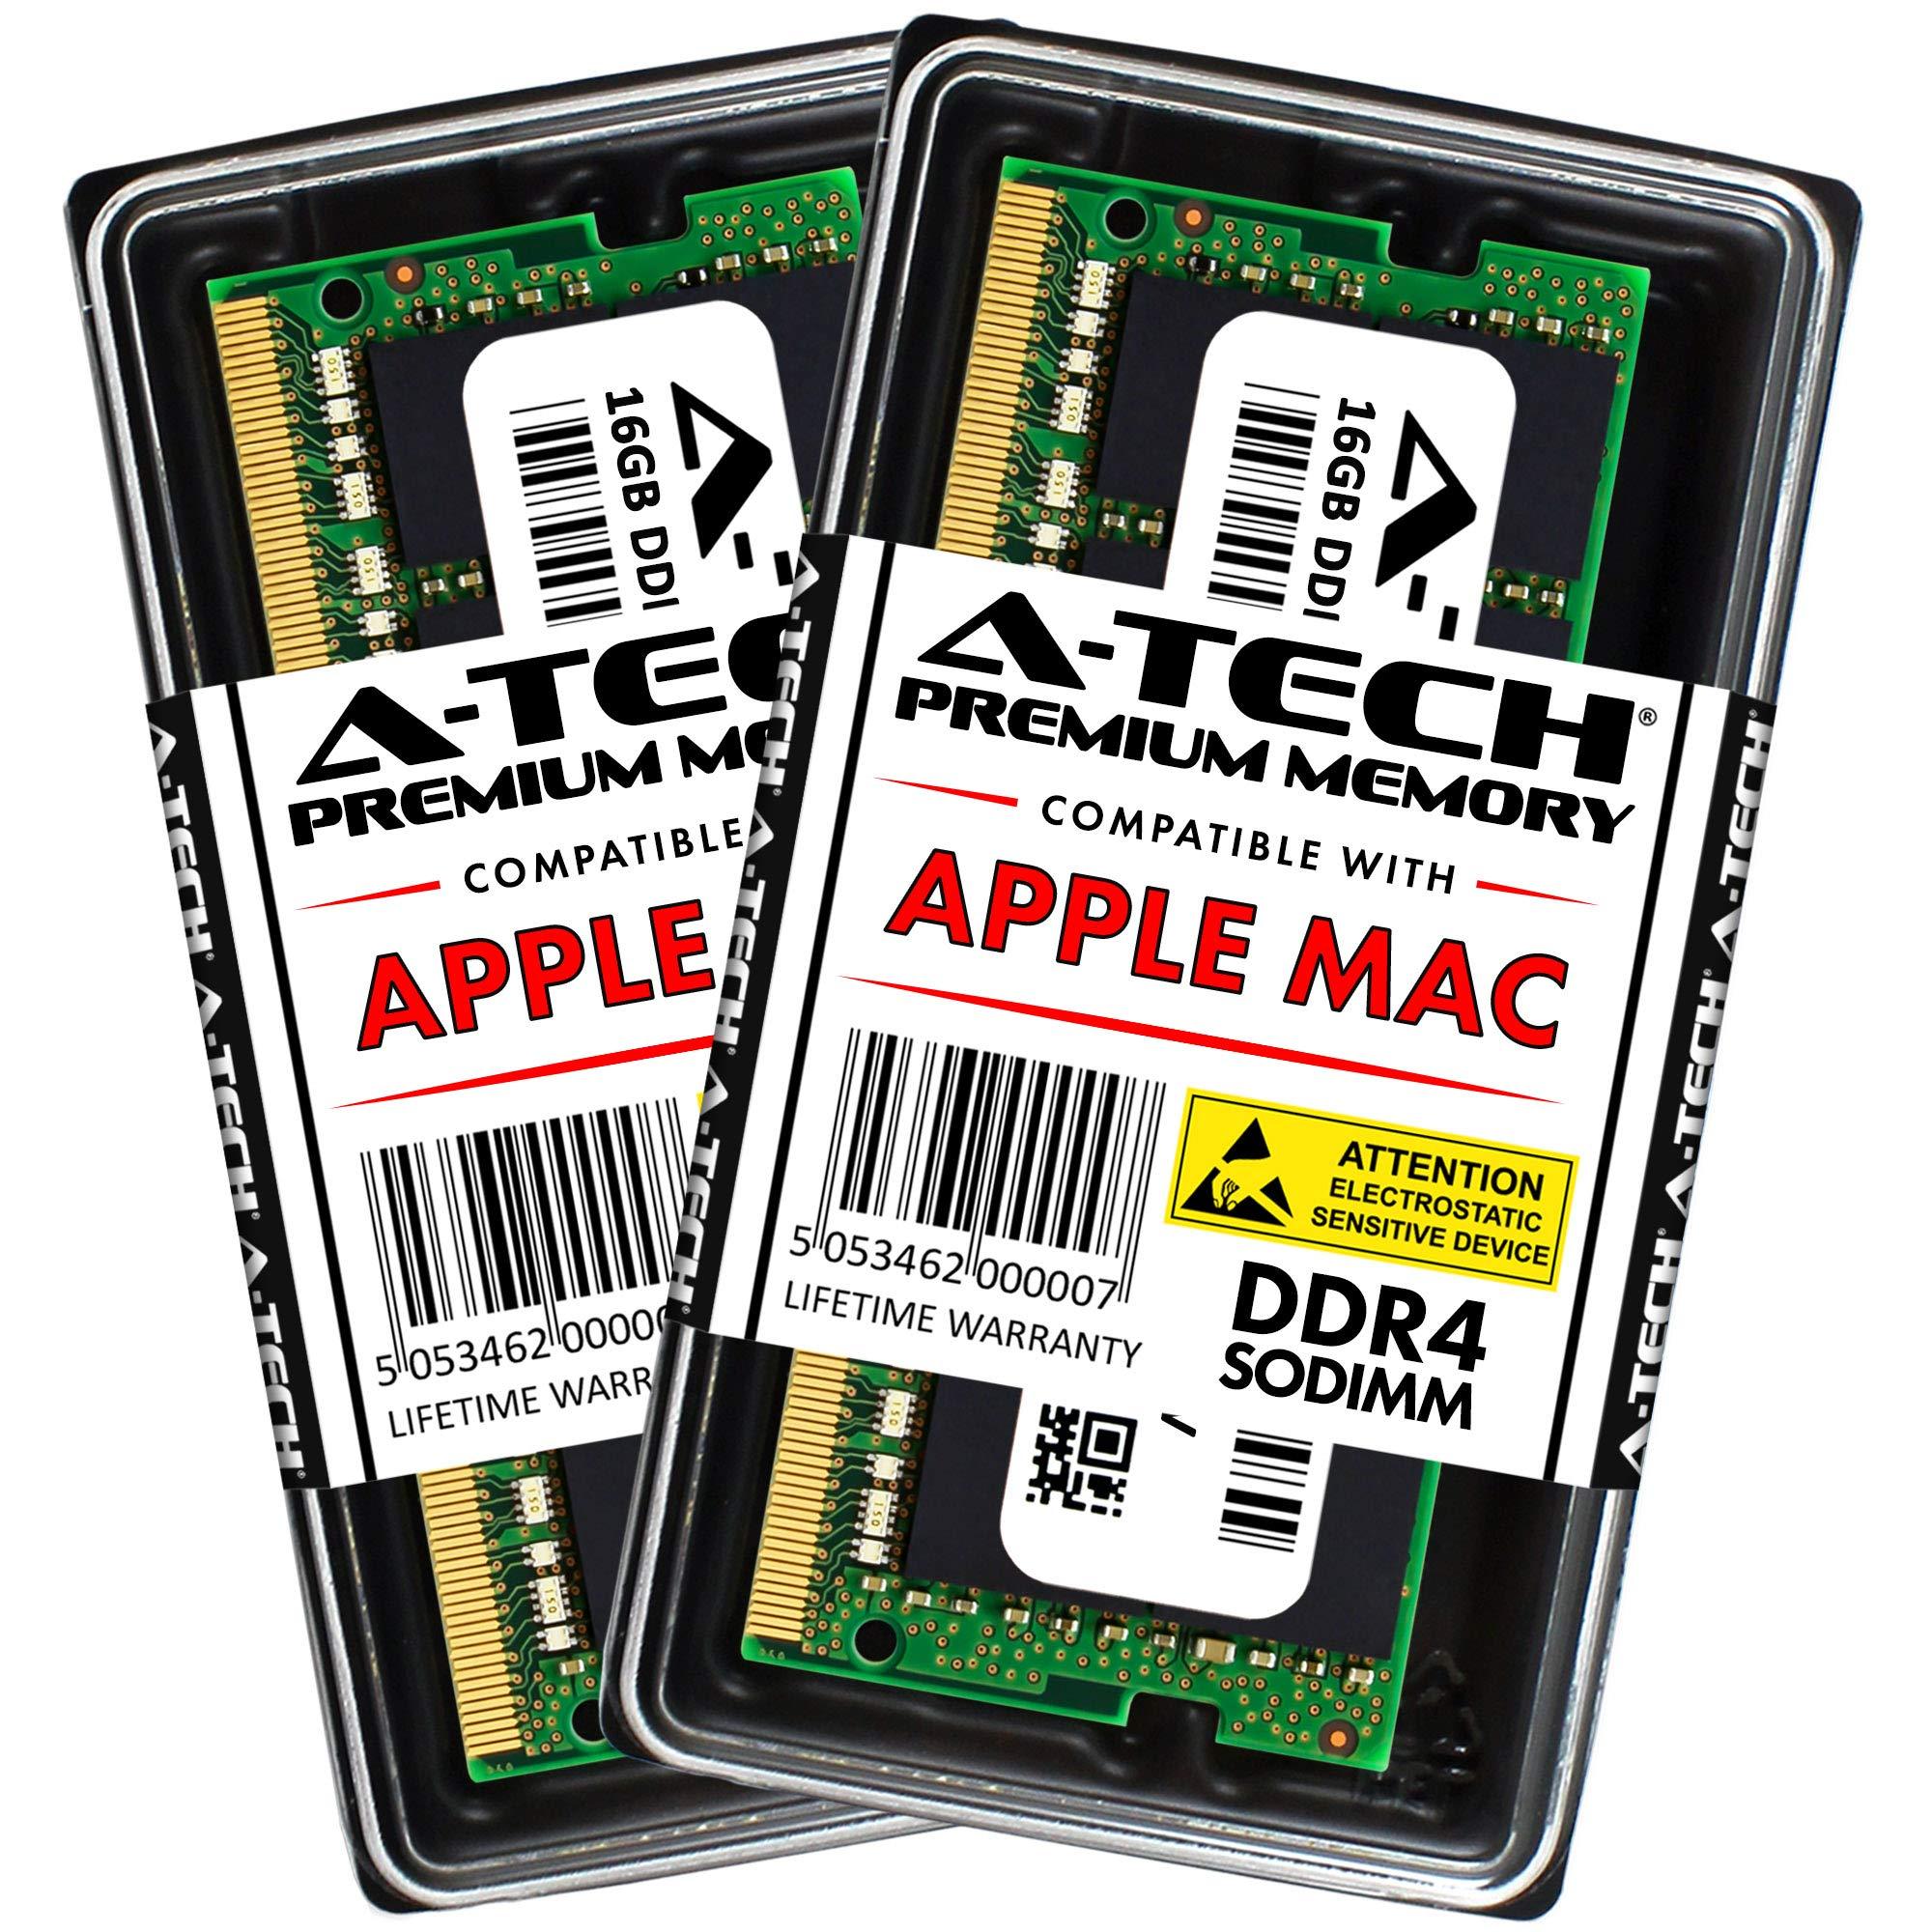 Memoria RAM 32GB A-Tech Kit (2 x 16GB) para 2019 Apple iMac 27 inch Retina 5K (iMac191 A2115) 2018 Apple Mac Mini (Macmi